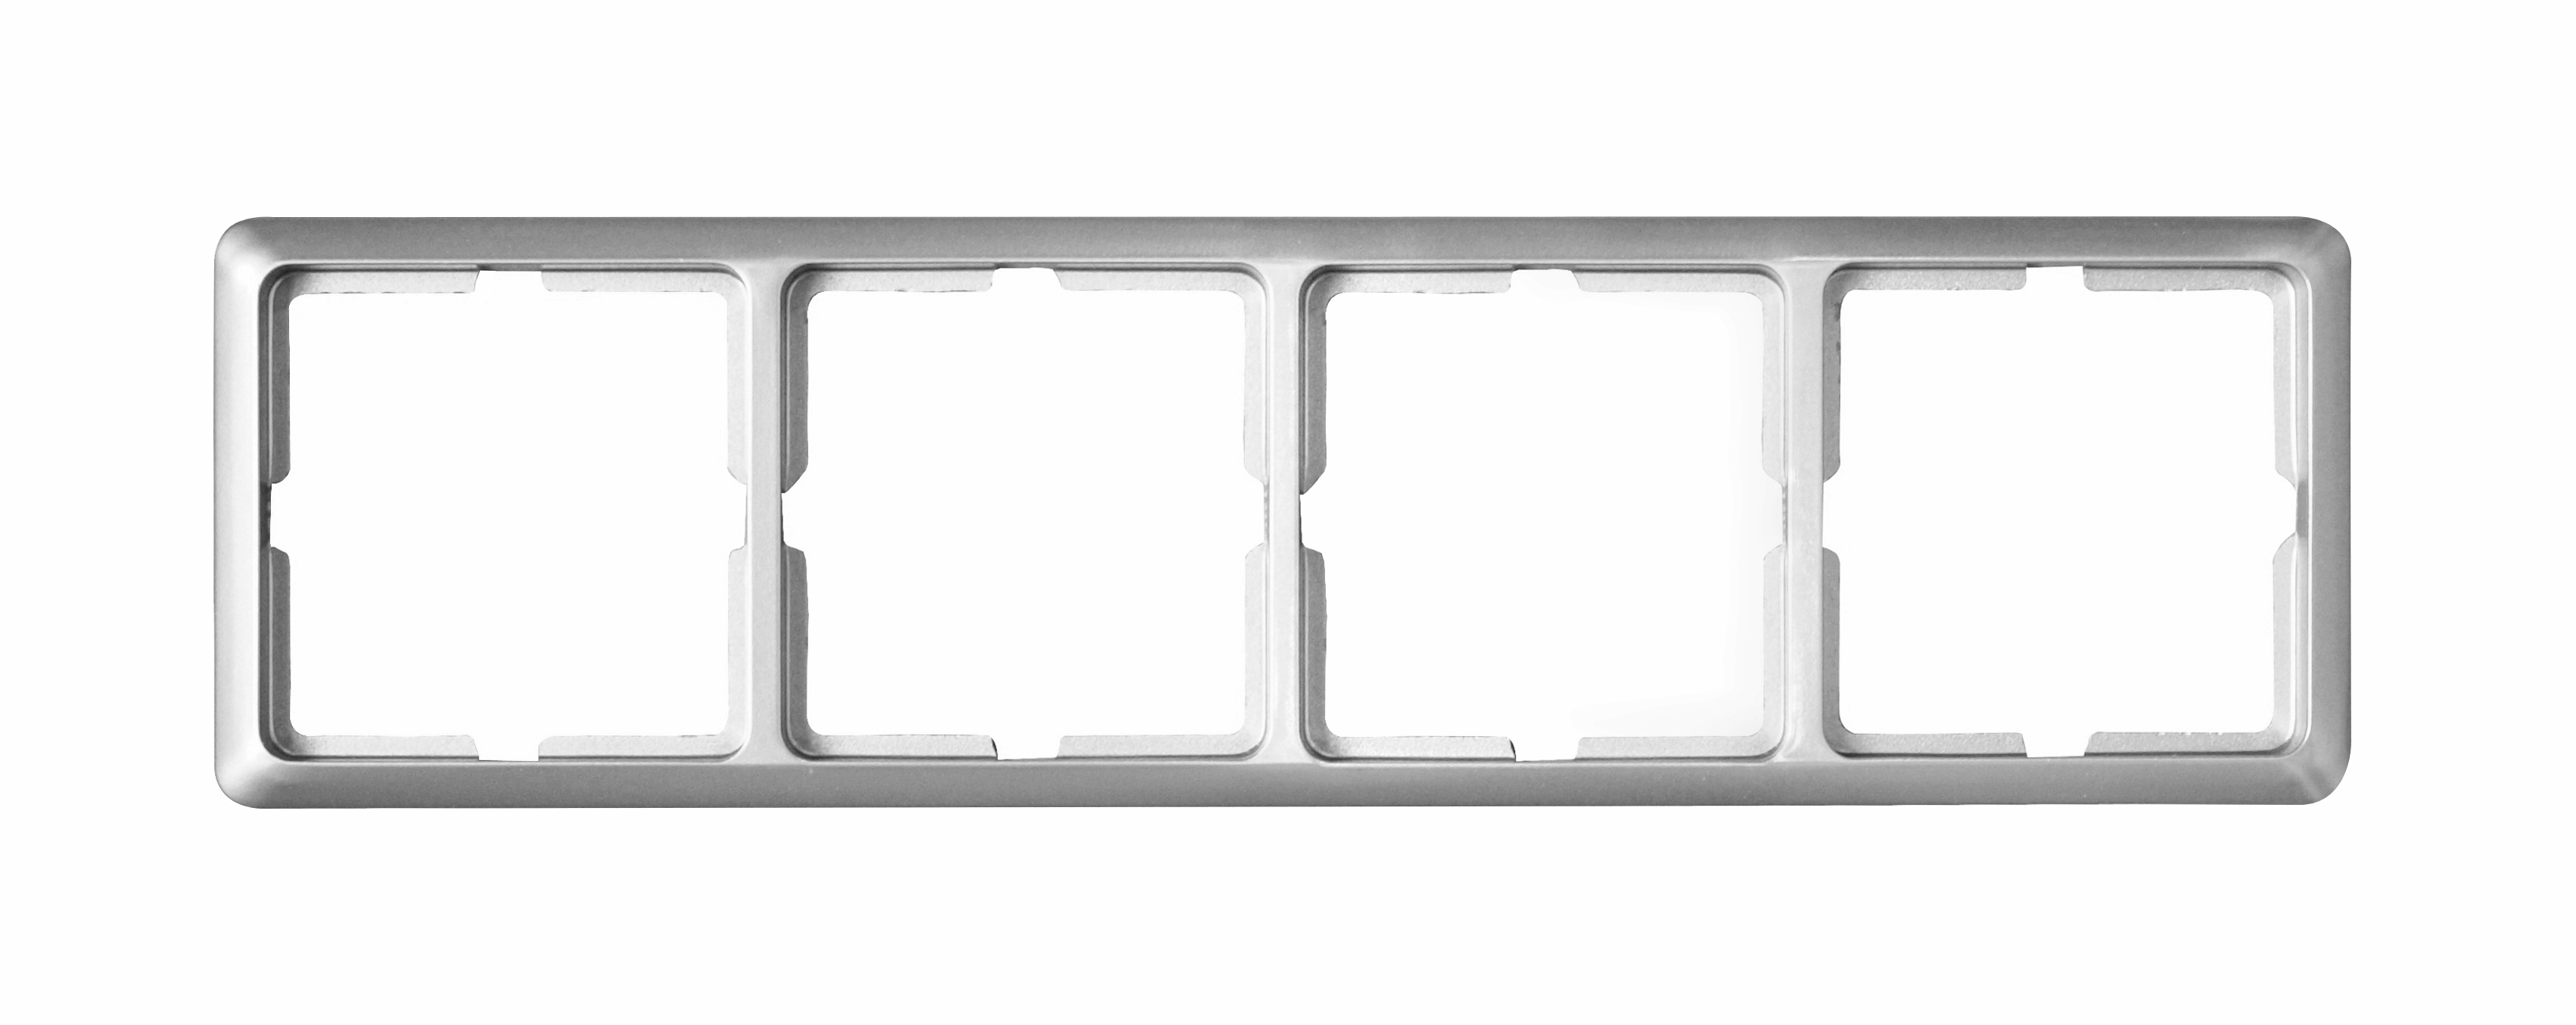 1 Stk Rahmen 4-fach, Alueffekt Scala EL2044119-